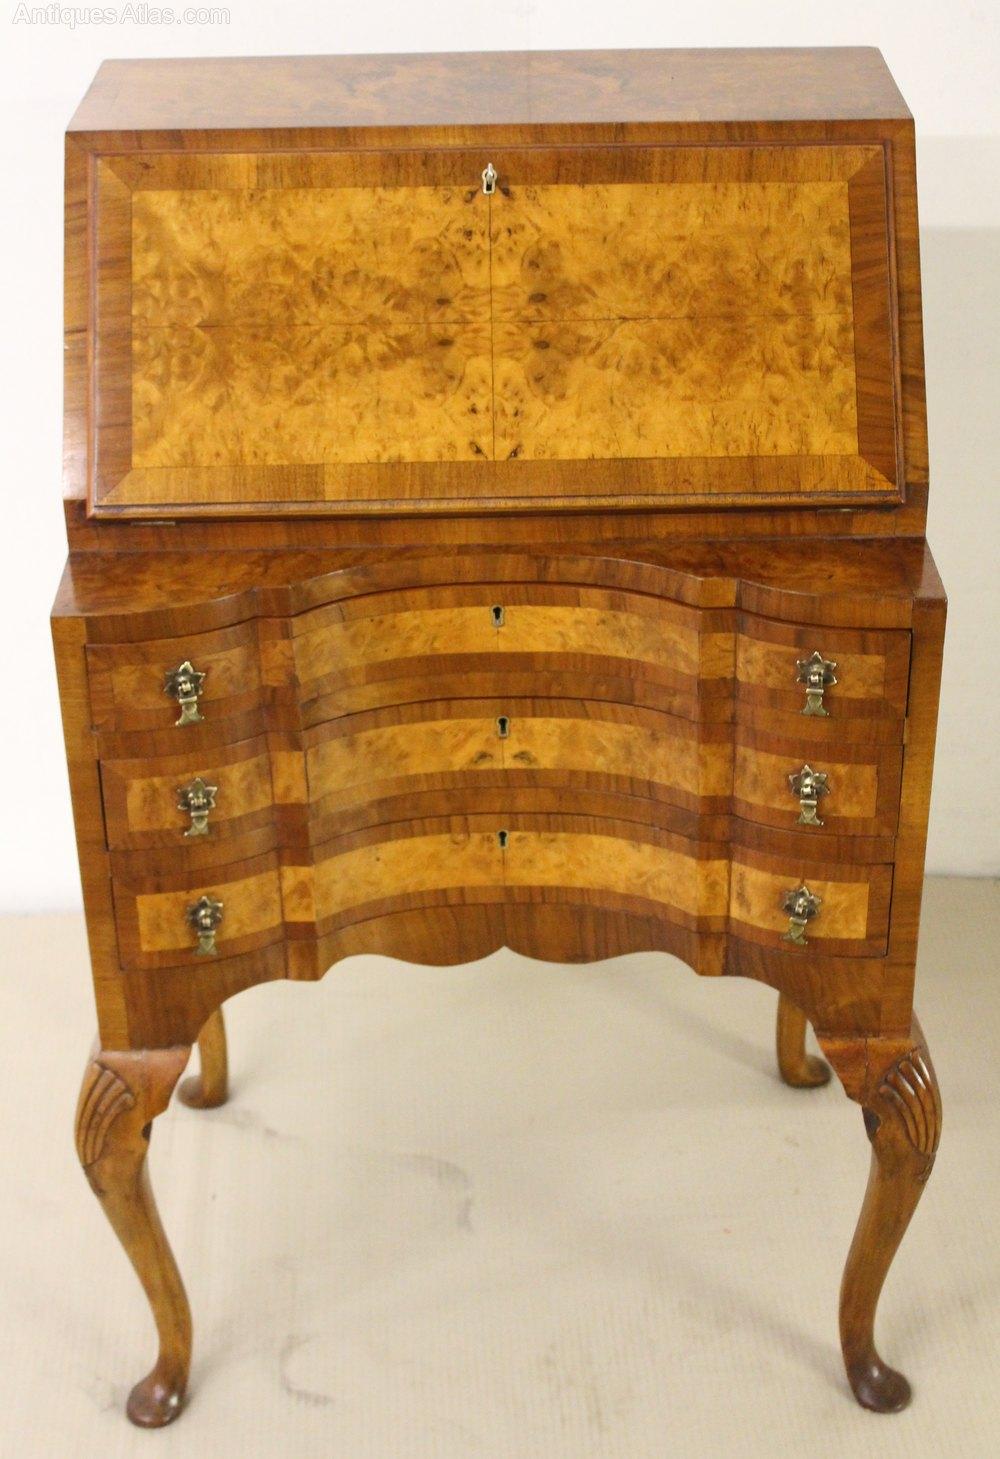 queen anne style burr walnut bureau antiques atlas. Black Bedroom Furniture Sets. Home Design Ideas